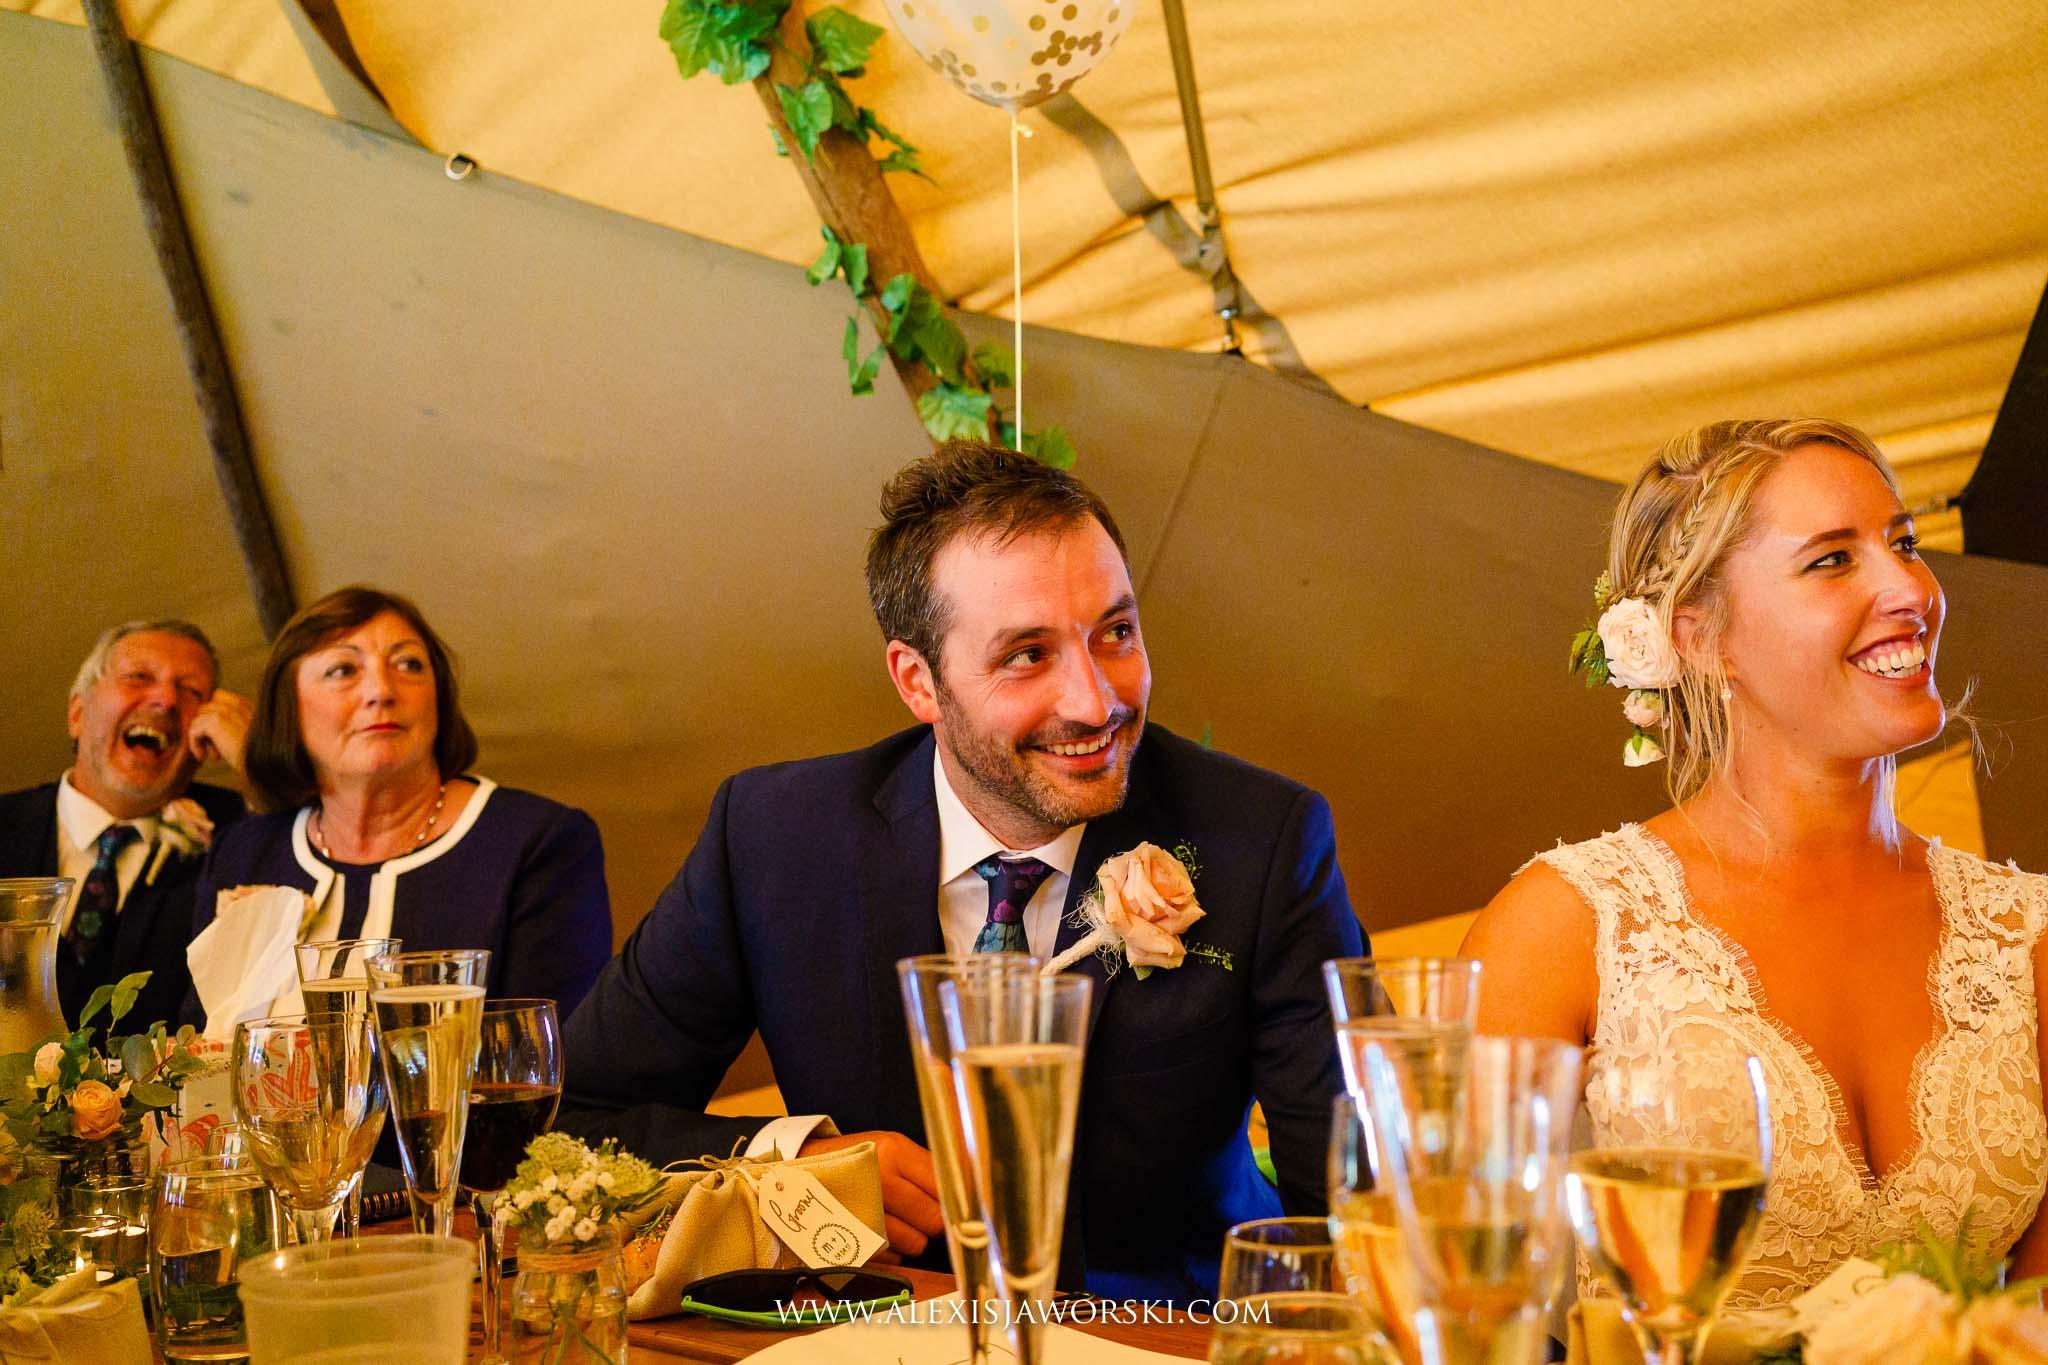 thee wedding speeches